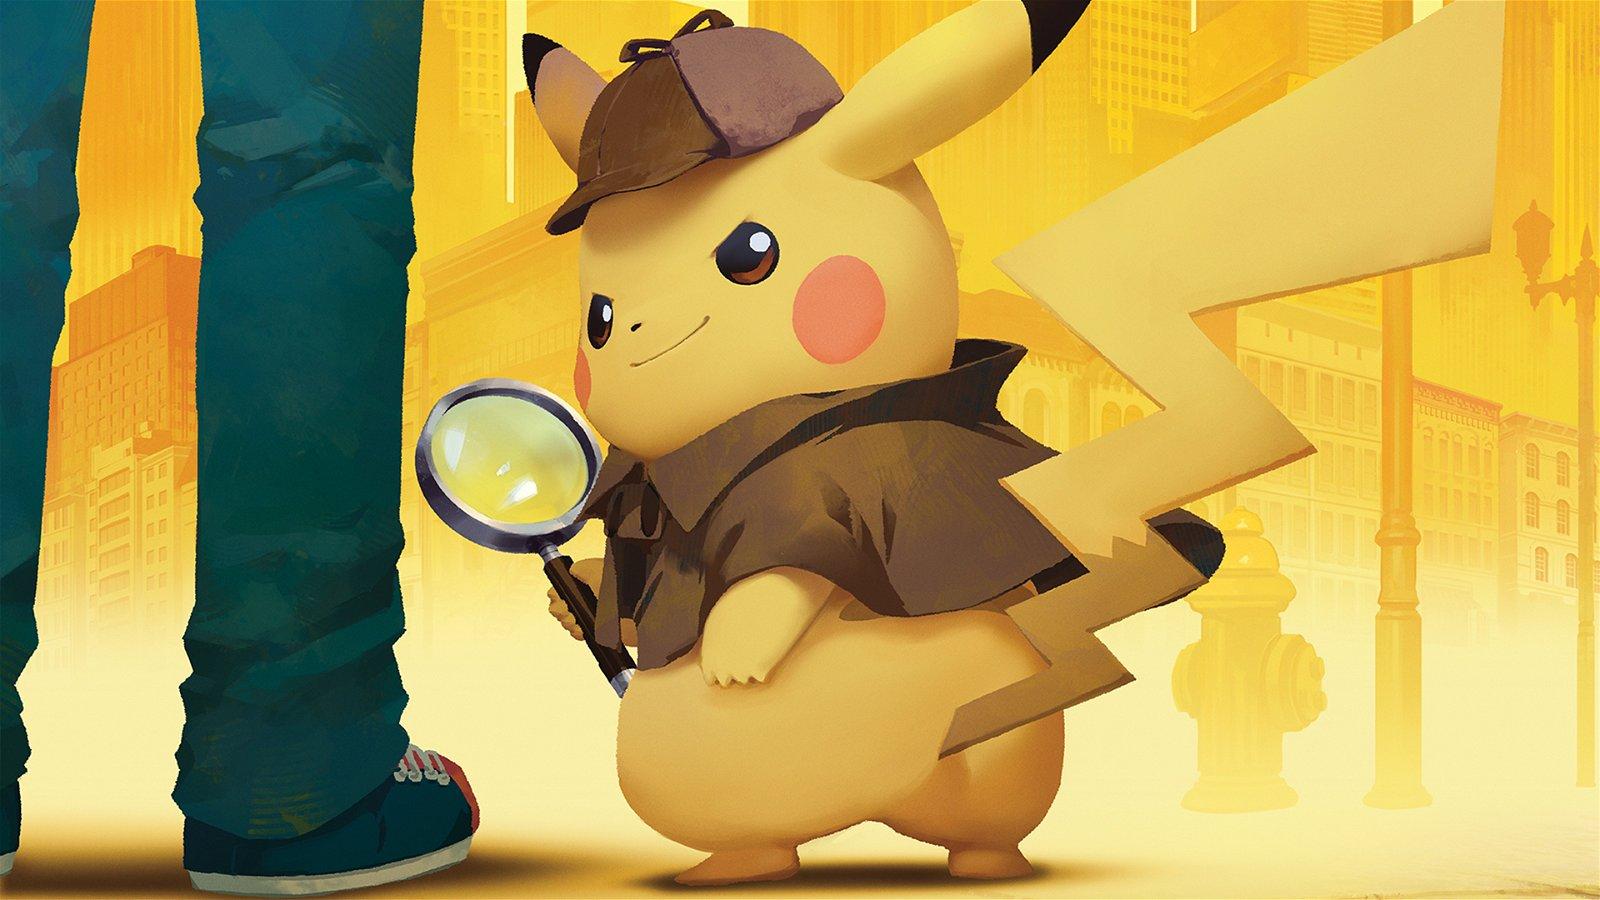 detective pikachu 3ds review